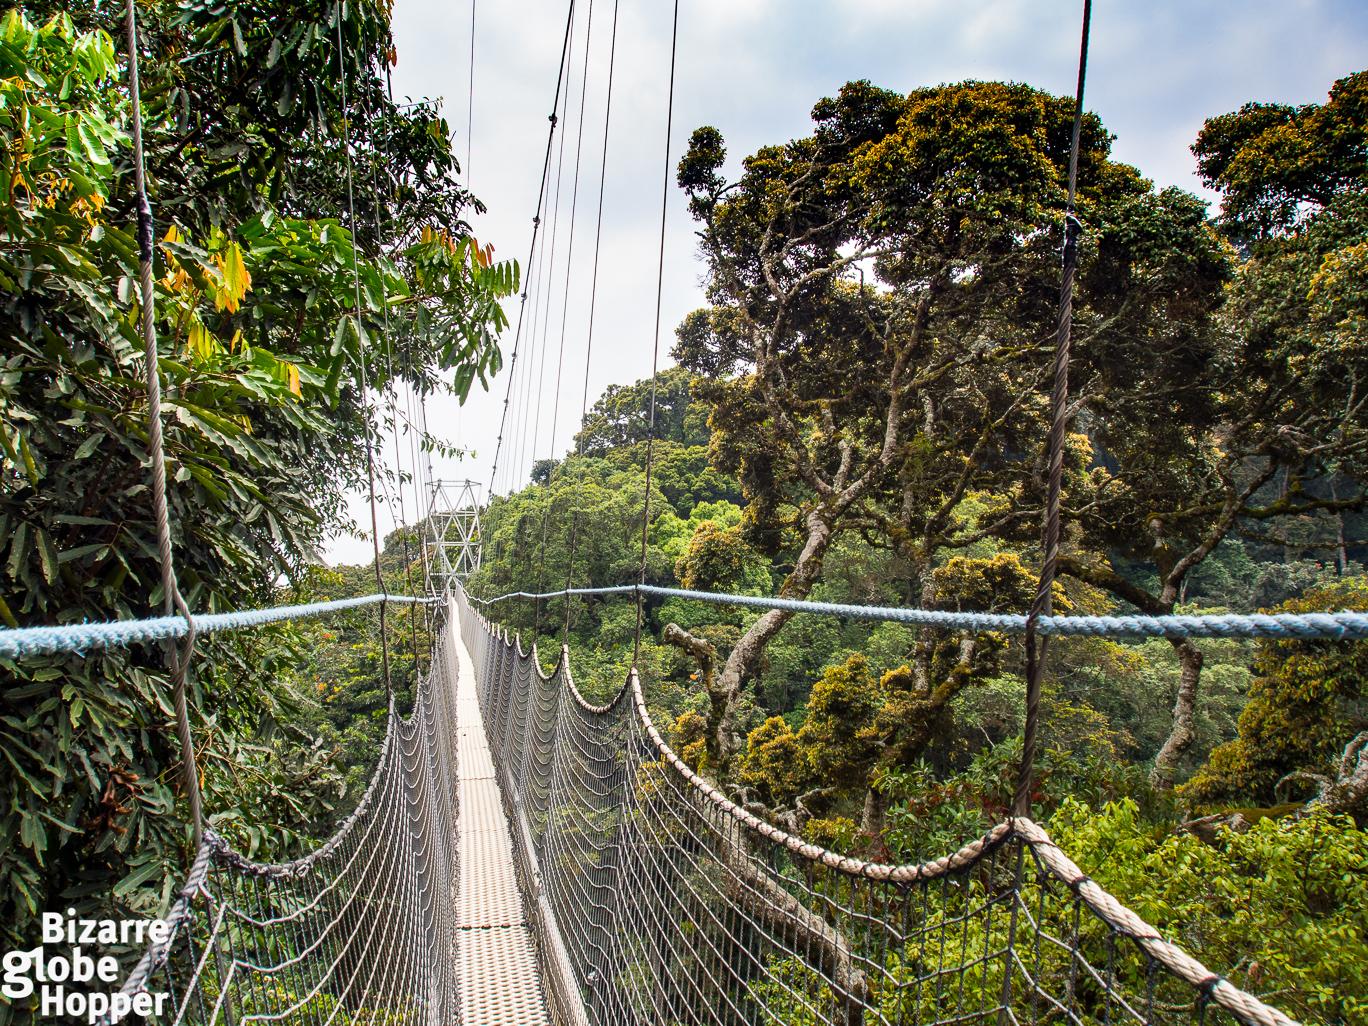 Nyungwe Forest Canopy Walkway Rwanda & Canopy Trekking in Nyungwe Forest Rwanda u2013 Bizarre Globe Hopper